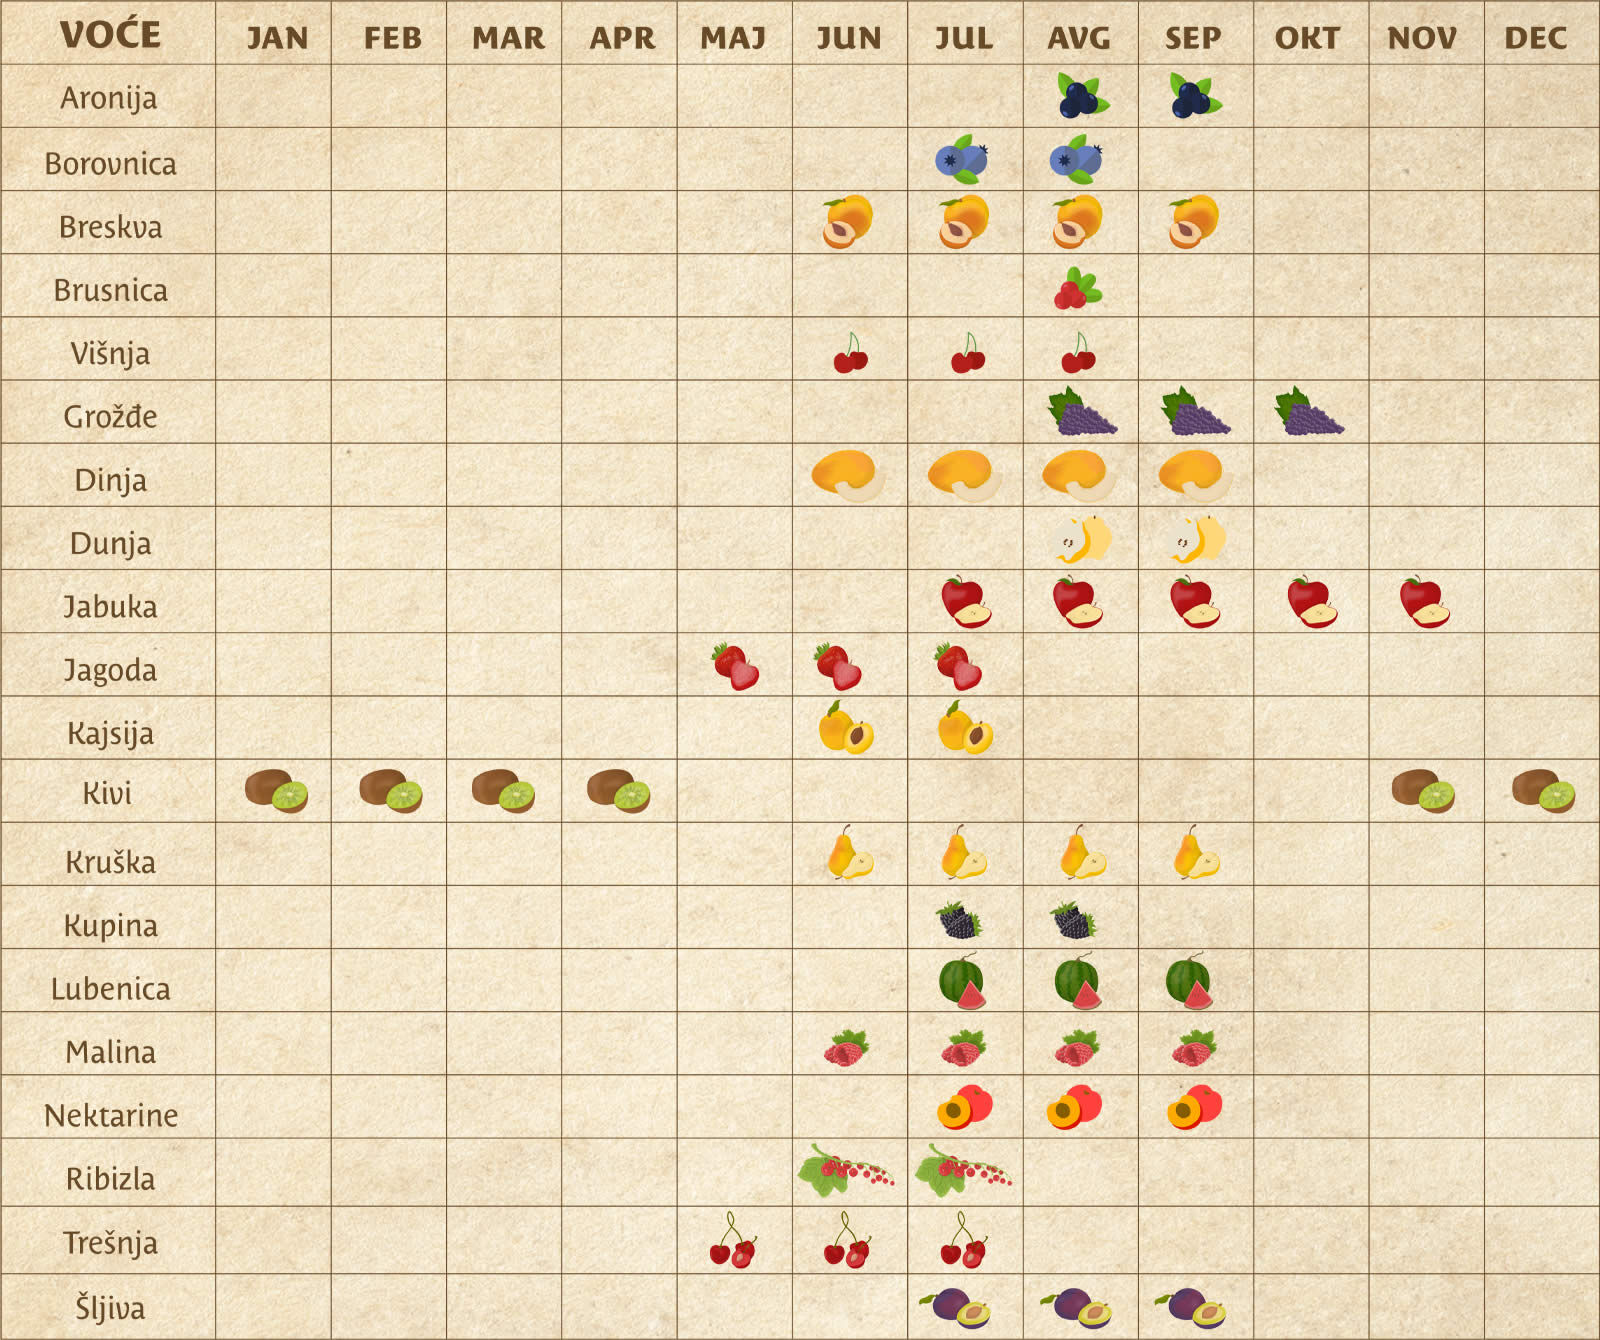 Kalendar voća